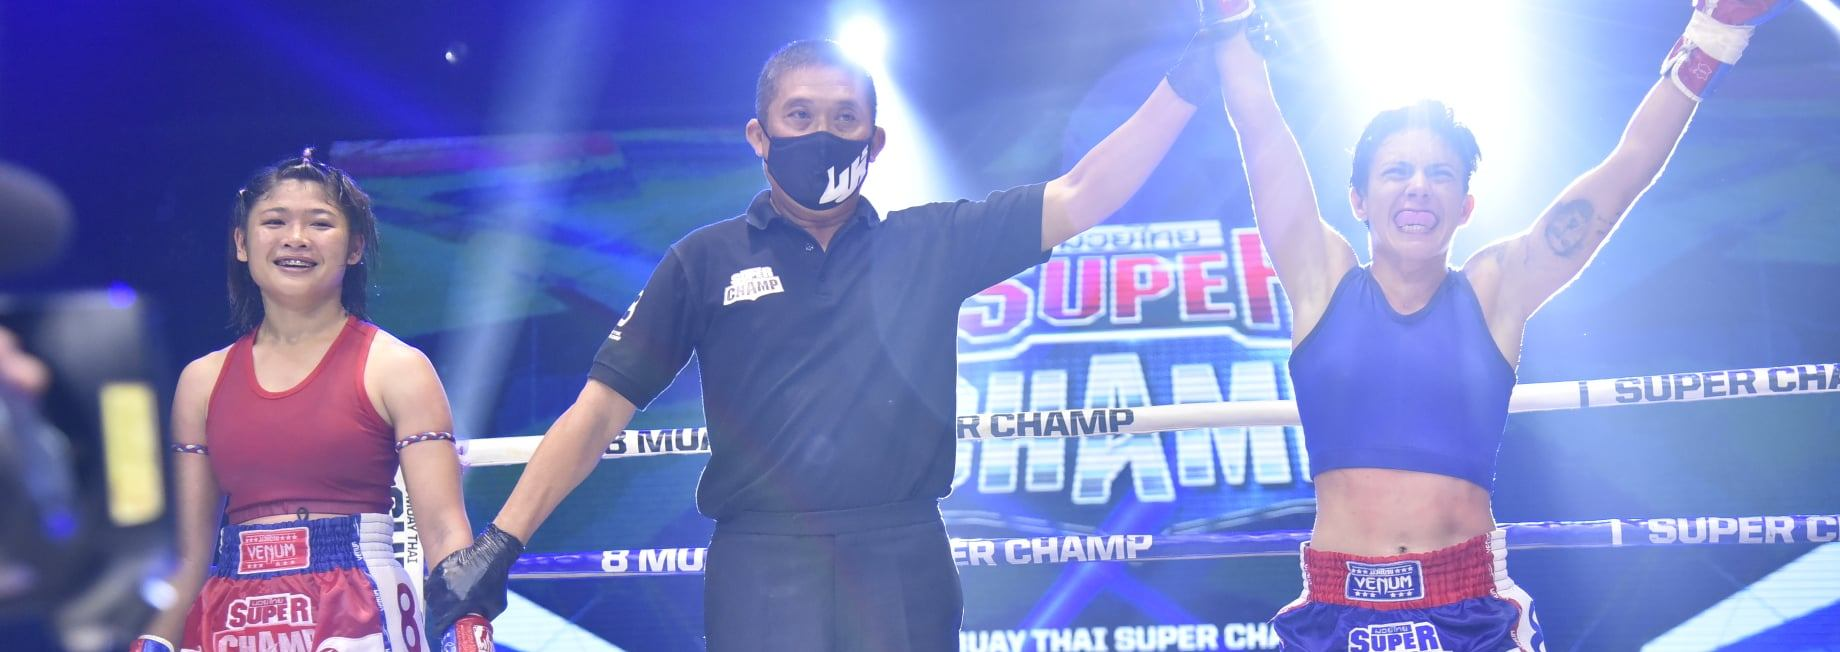 Muay Thai Super Champ - Full Fight Card